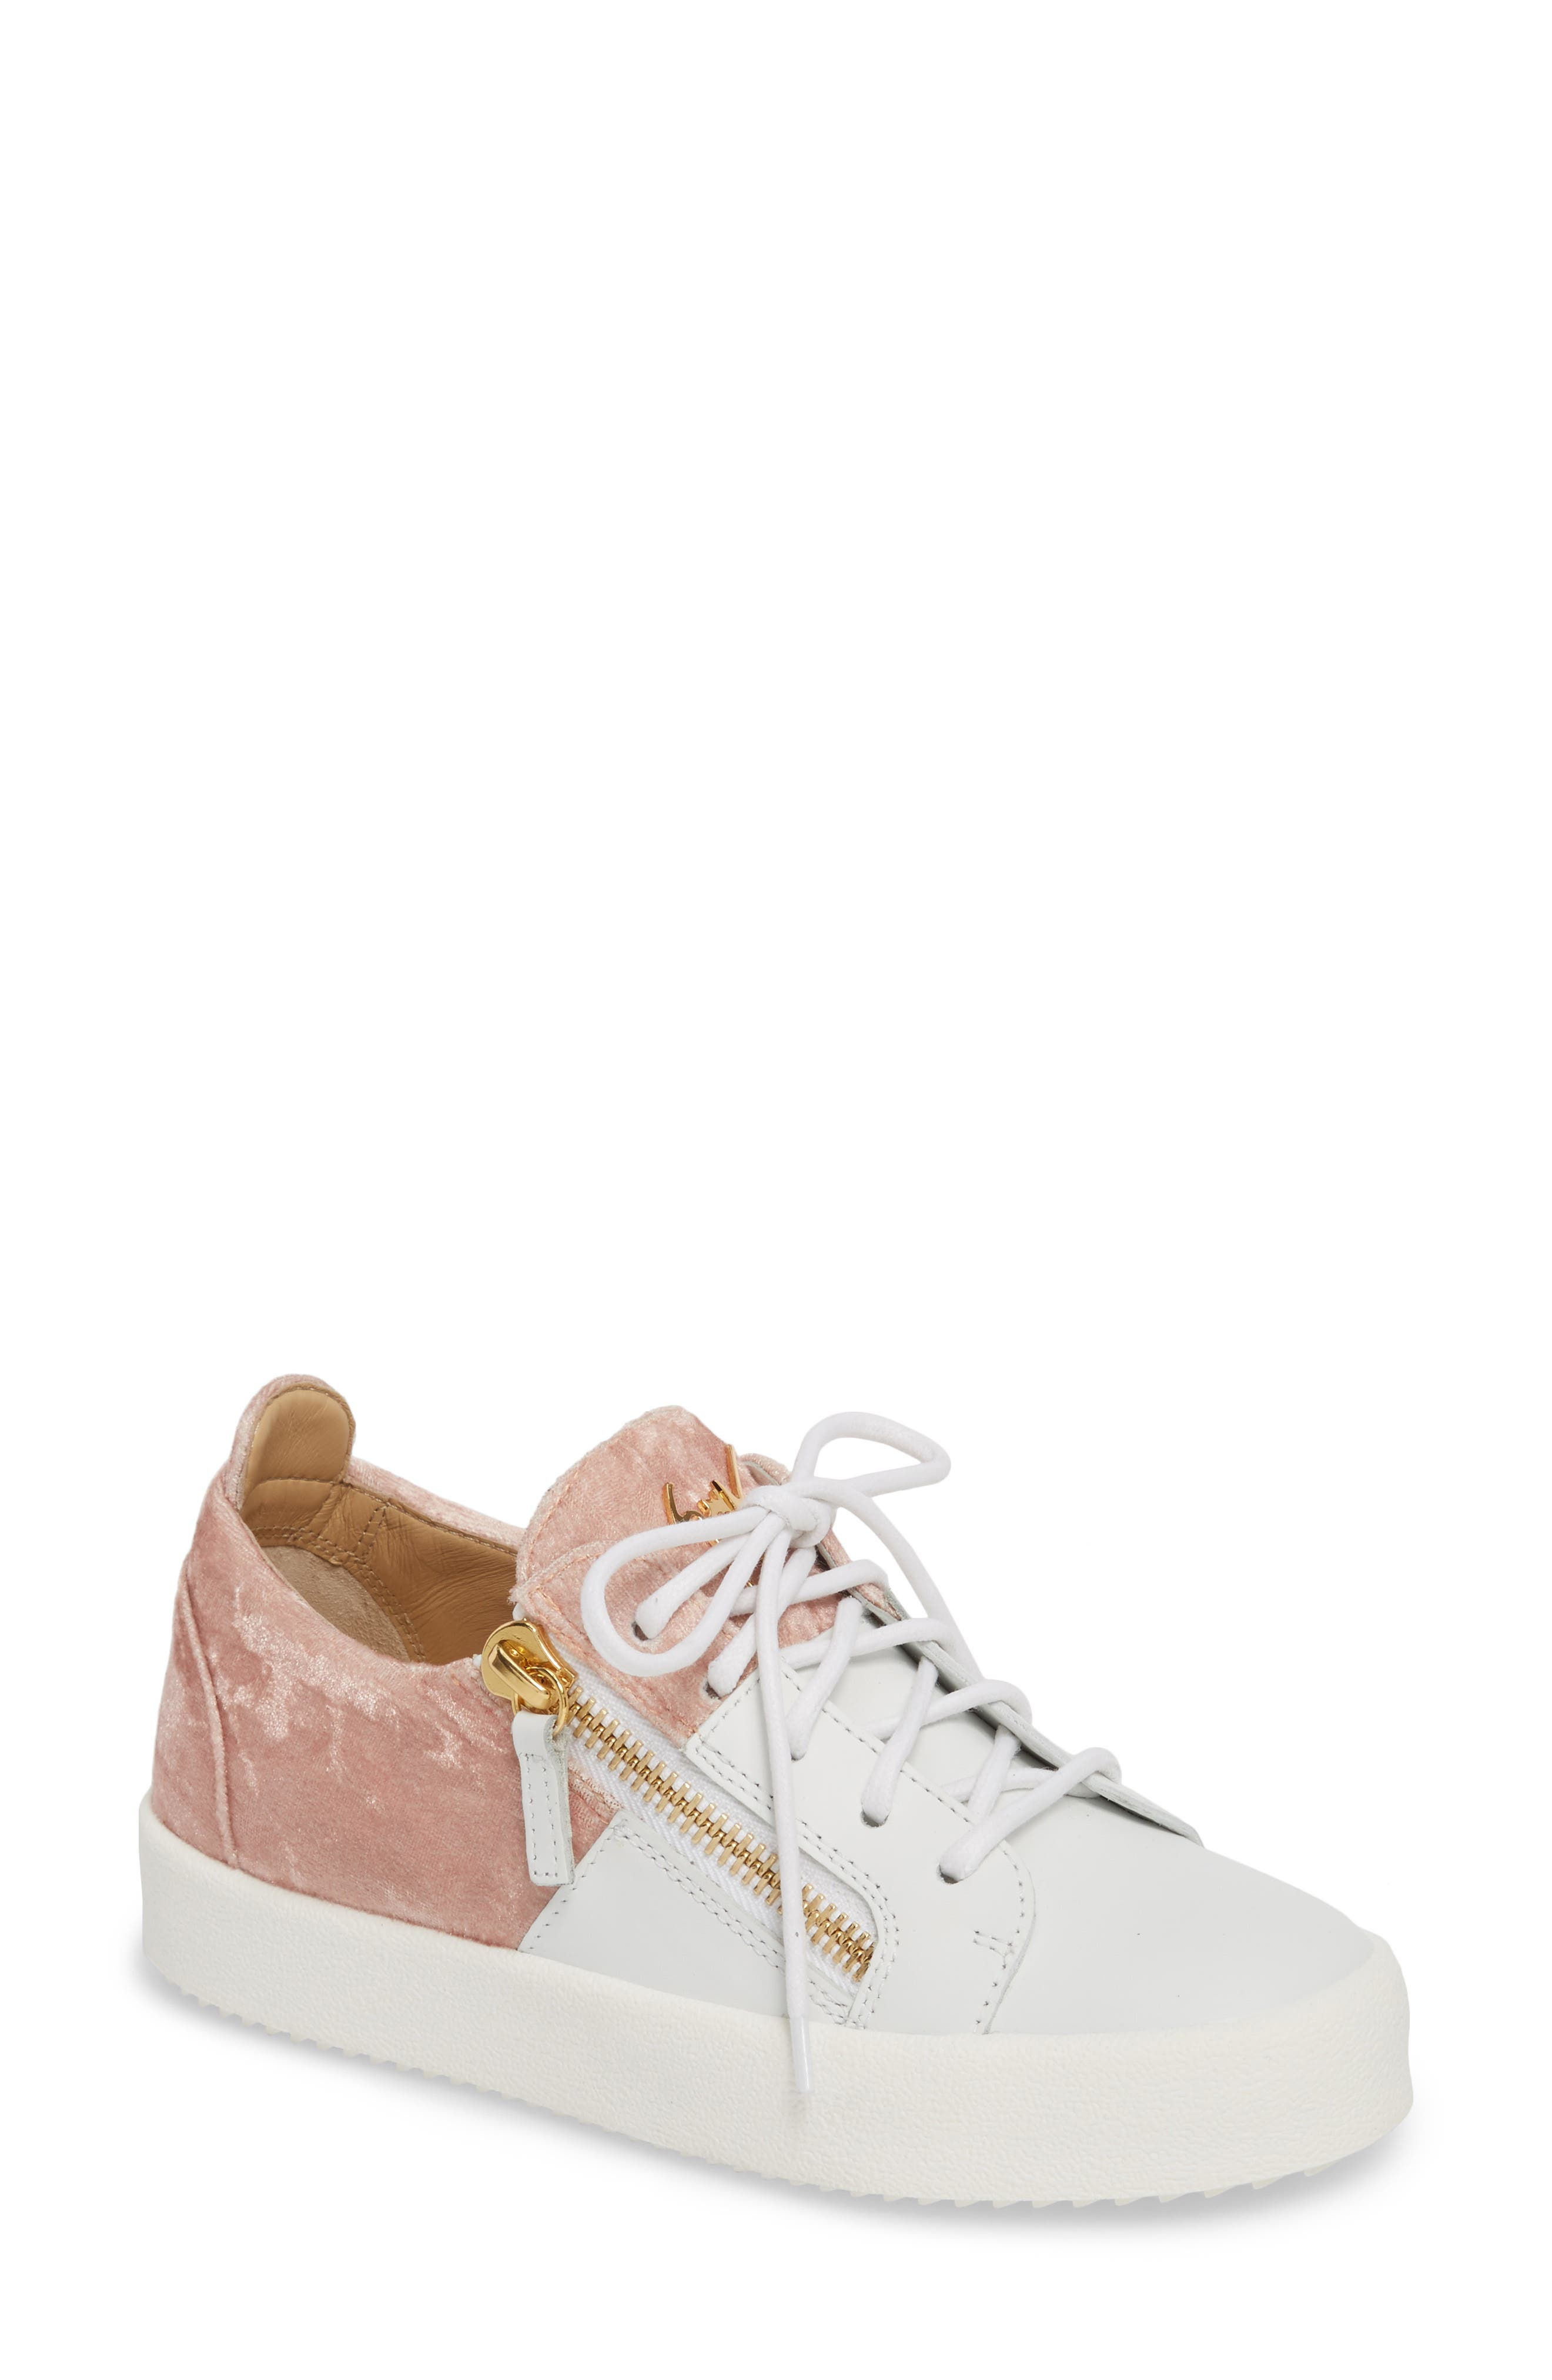 Alternate Image 1 Selected - Giuseppe Zanotti Mid Top Platform Sneaker (Women)